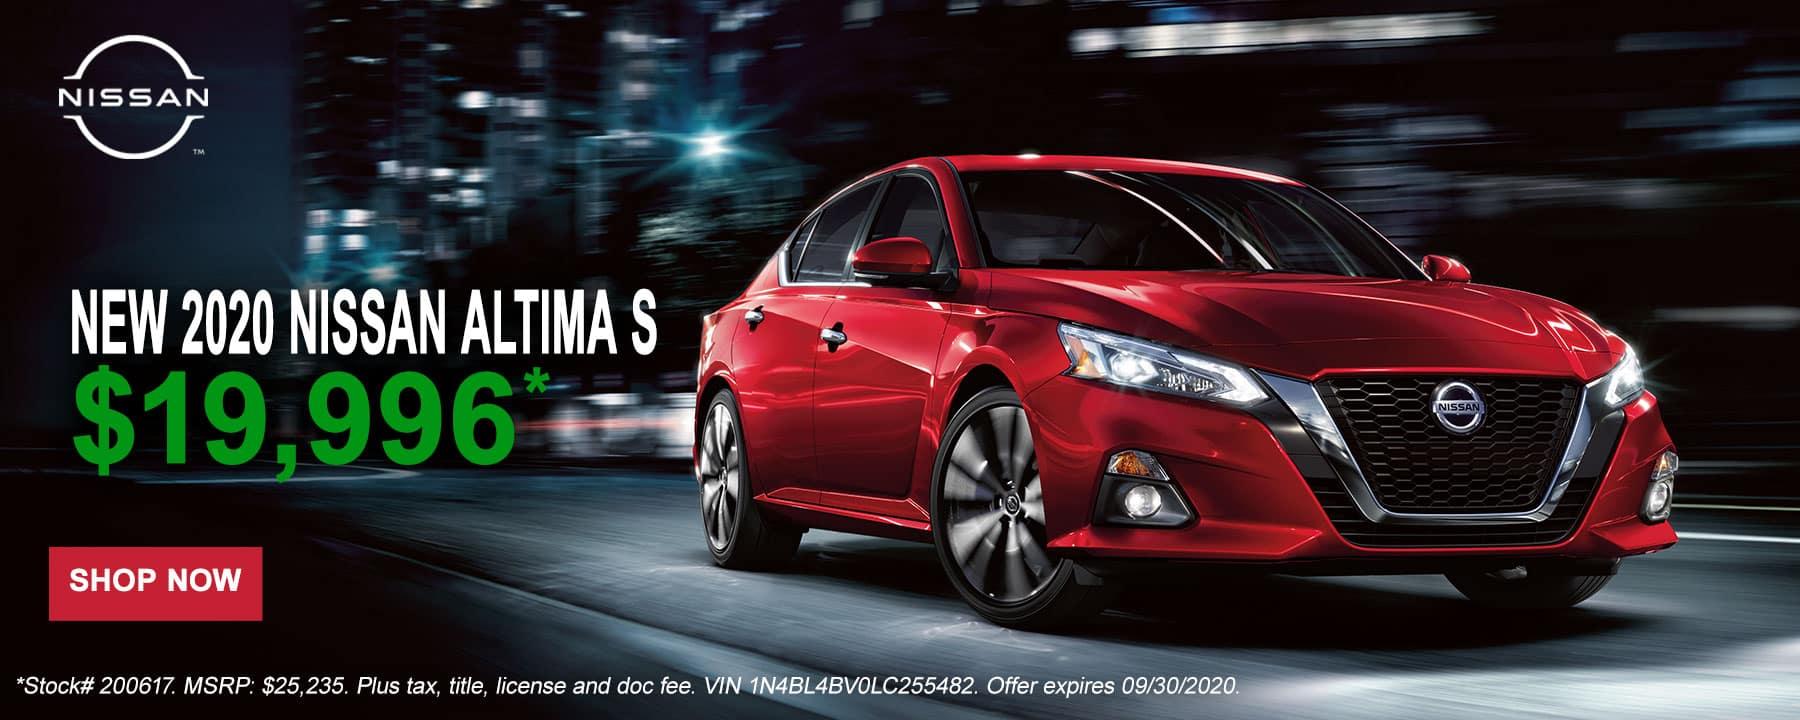 2020 Altima September Offer at Star Nissan